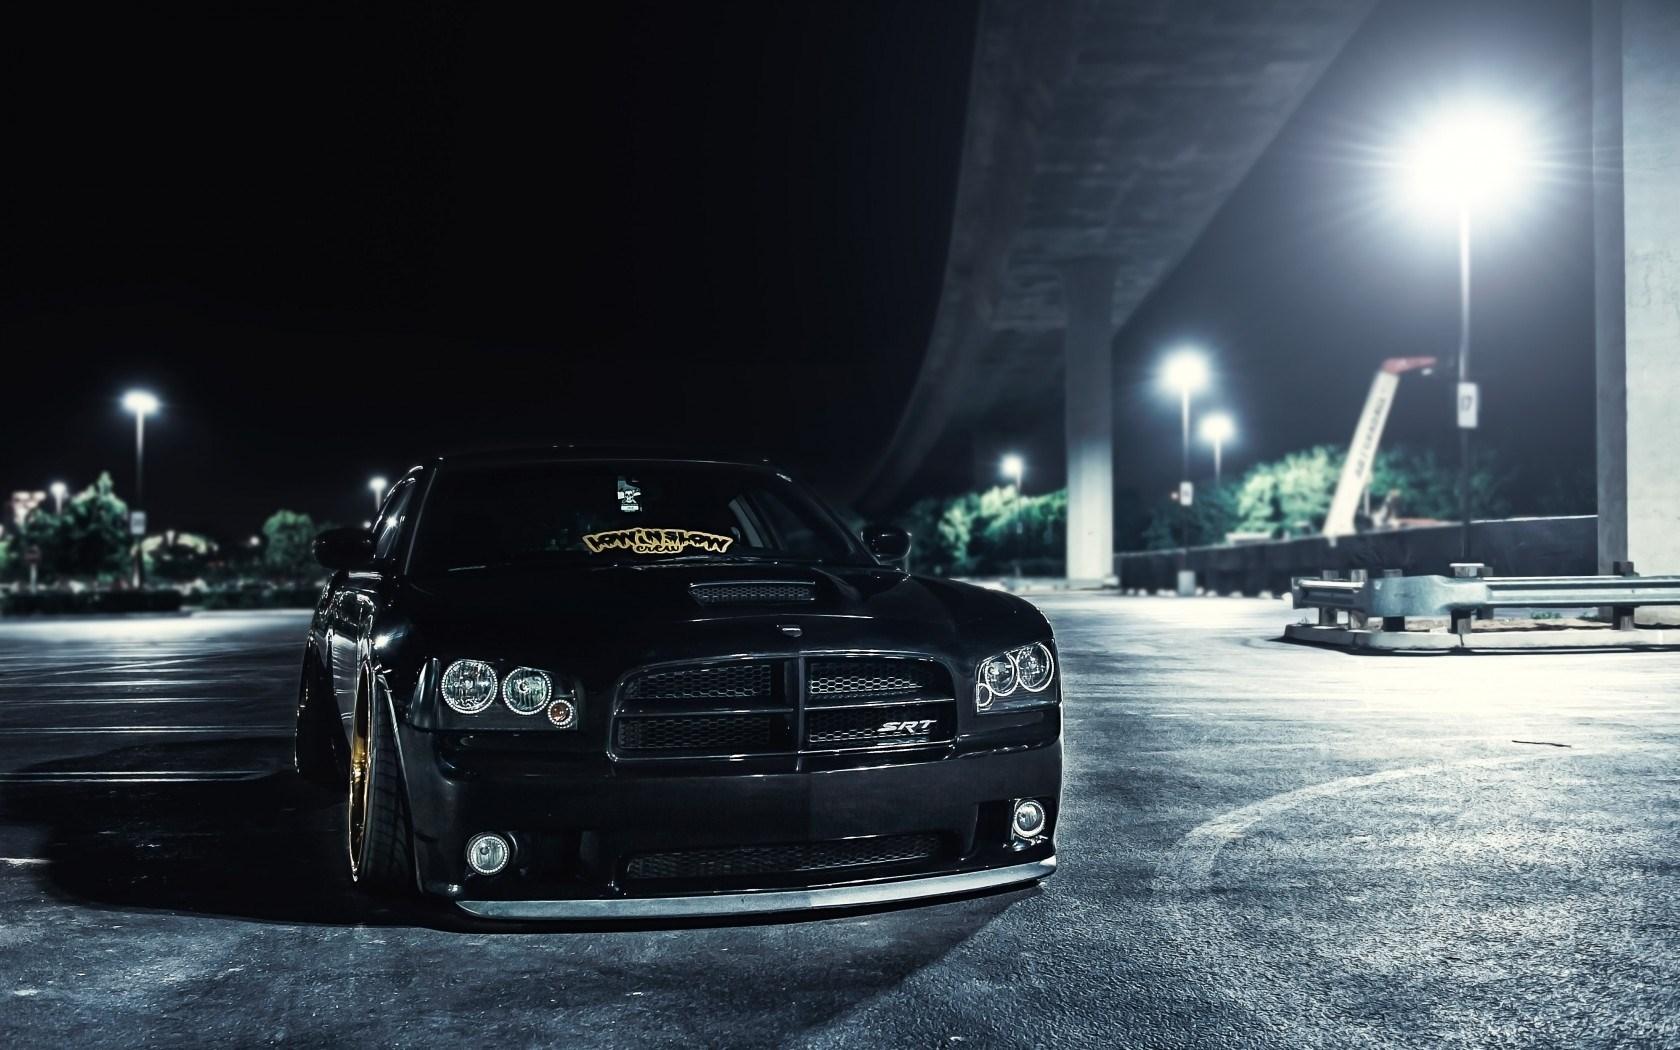 Dodge Charger SRT8 Supercharger Car Tuning